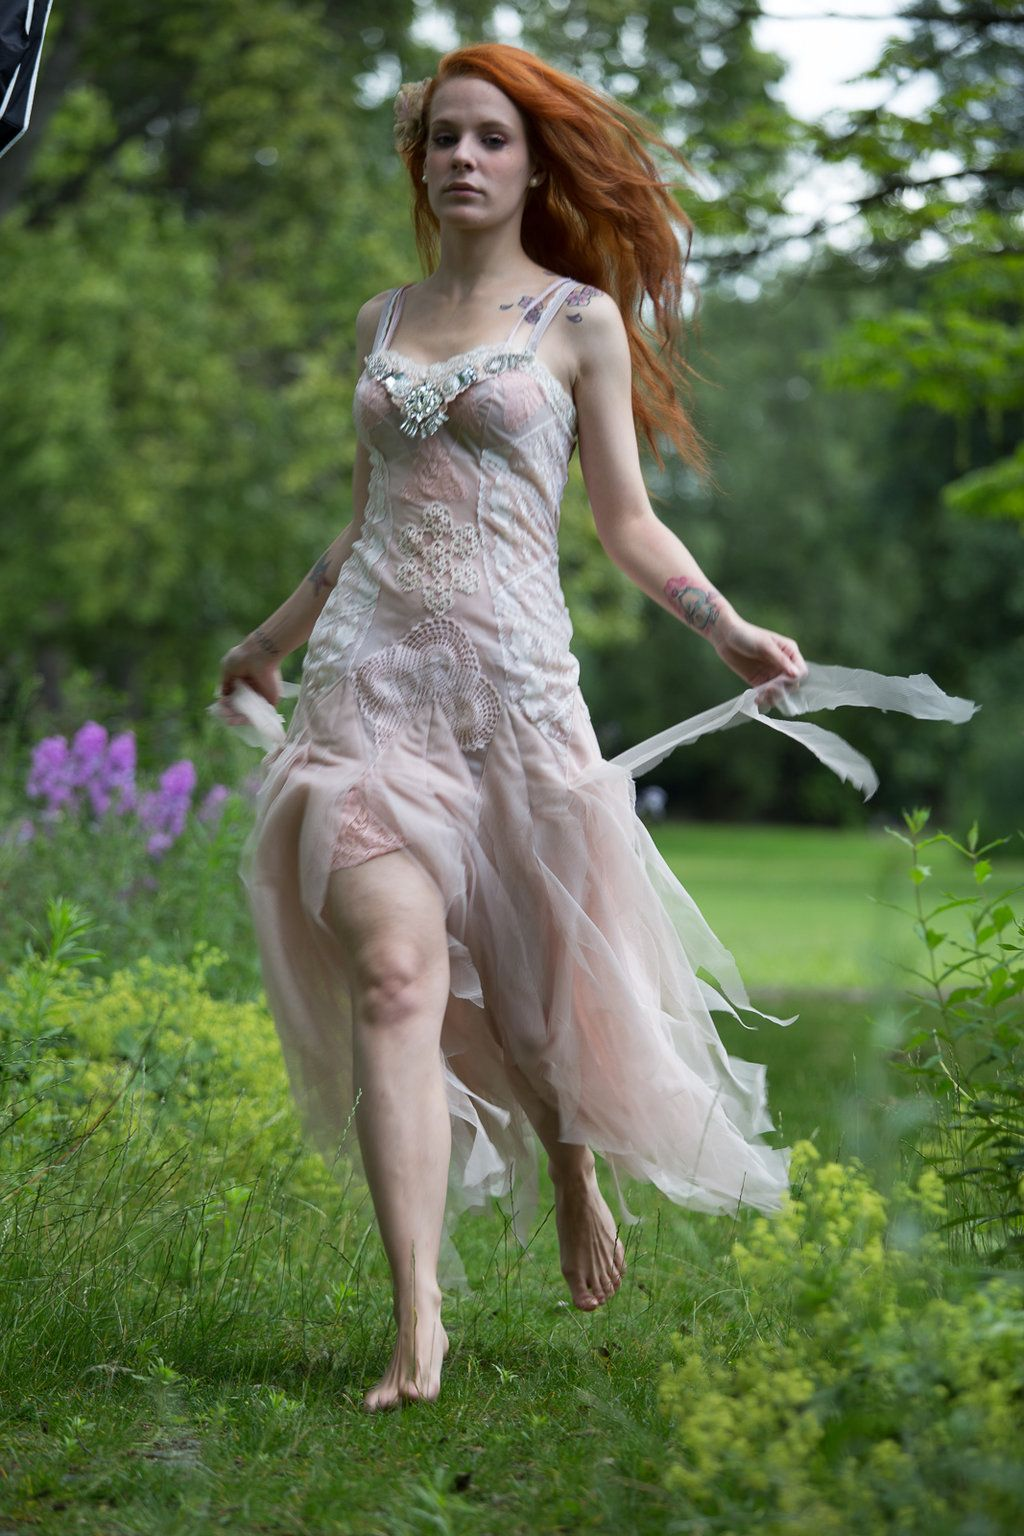 Fairy goddess girls nude-6401